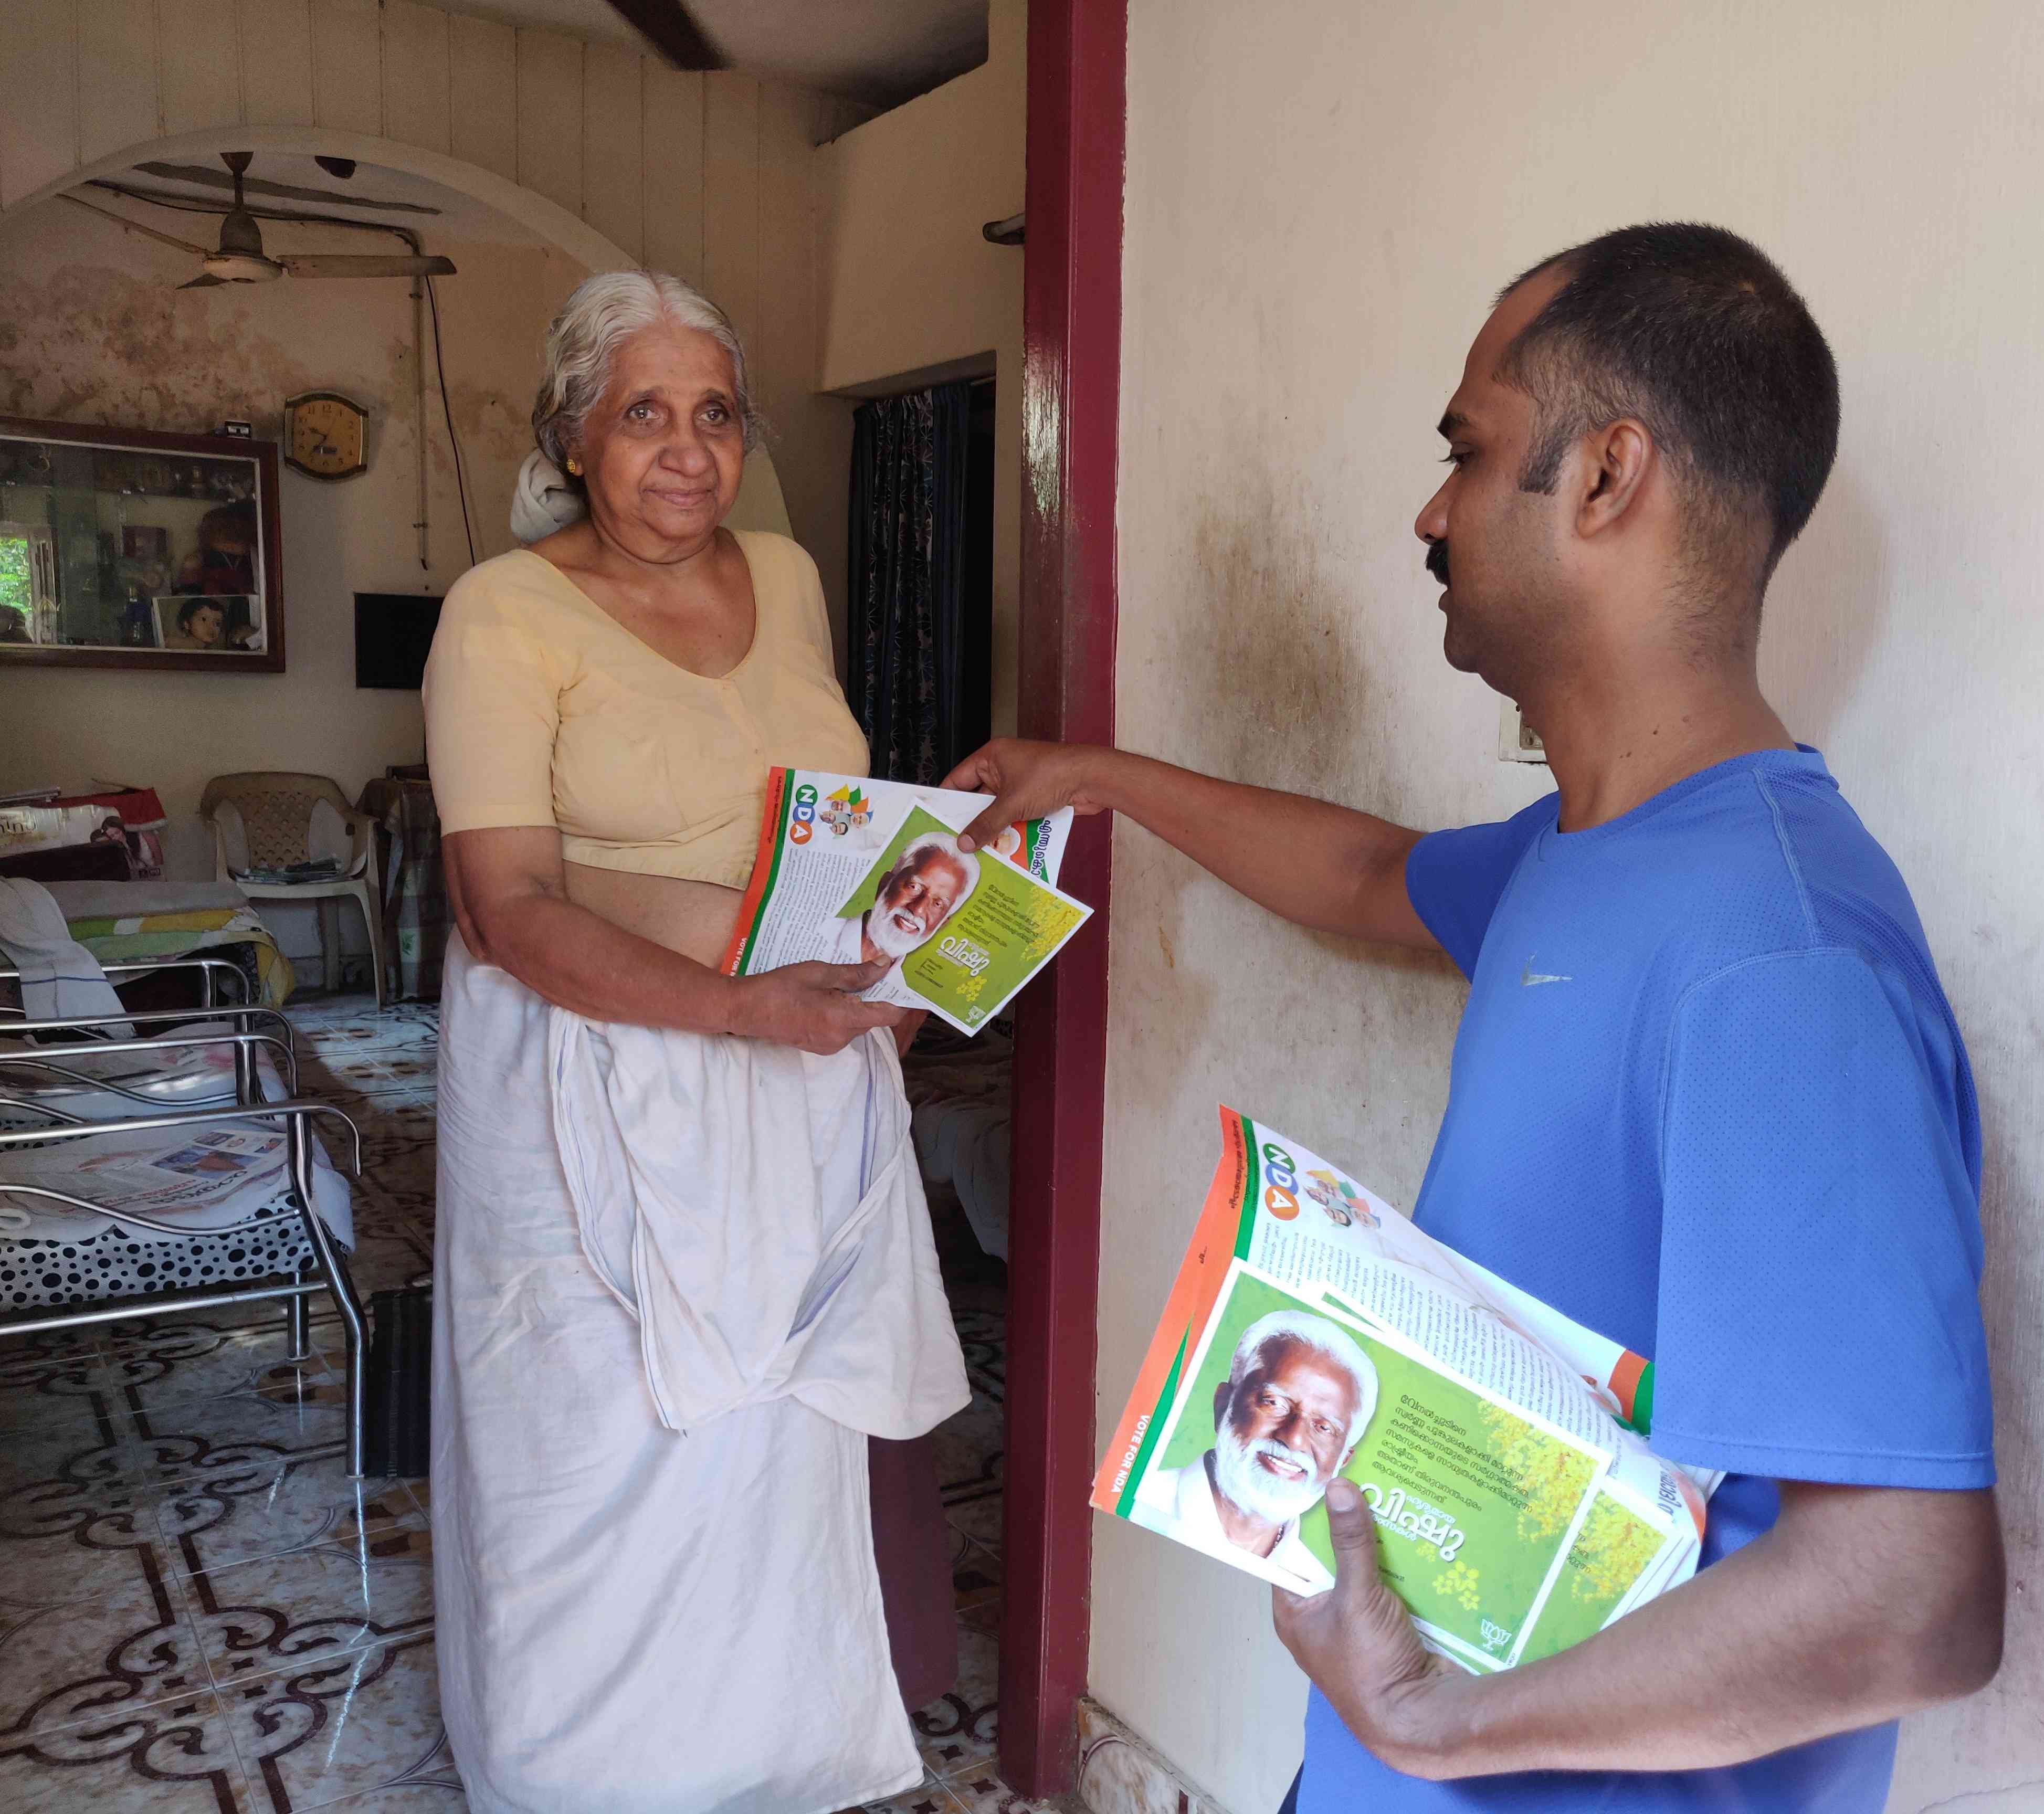 Page pramukh Sudheer meets a voter in Thiruvananthapuram. (Photo credit: TA Ameerudheen).